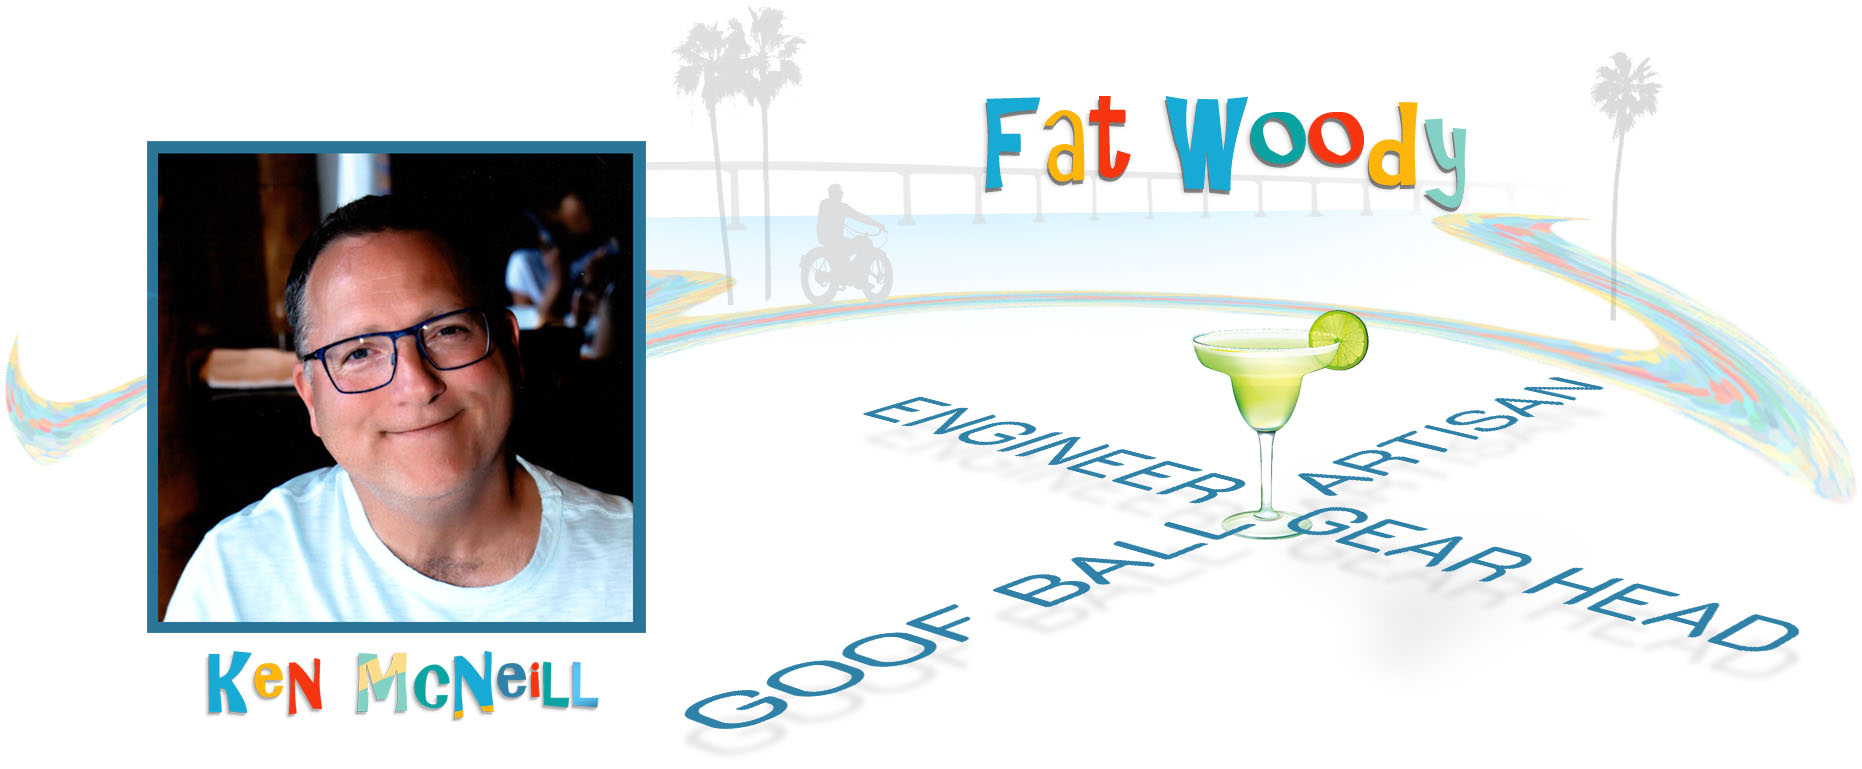 Ken McNeill - Fat Woody Creator.jpg